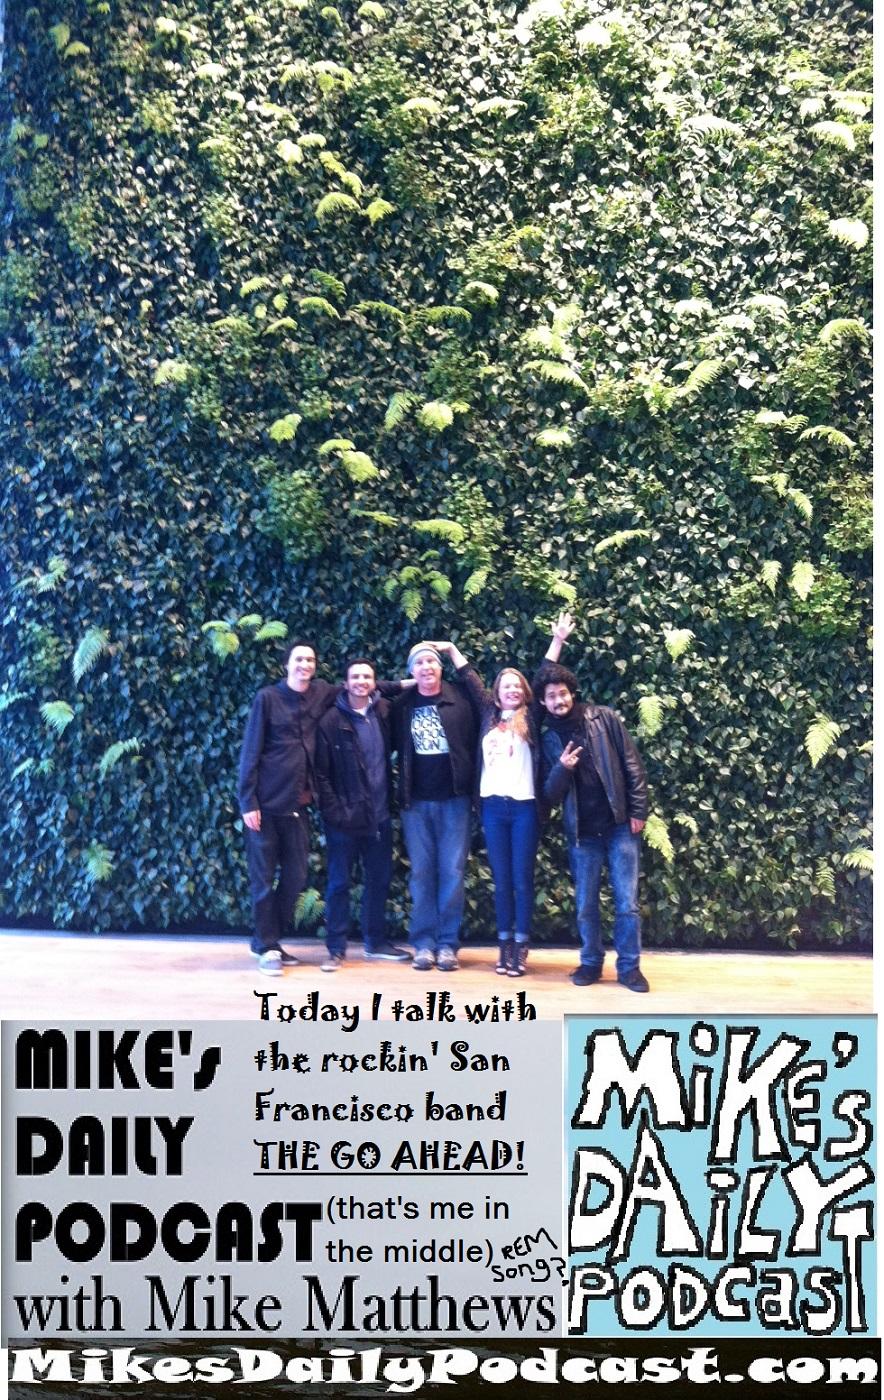 MIKEs DAILY PODCAST 1068 The Go Ahead san francisco